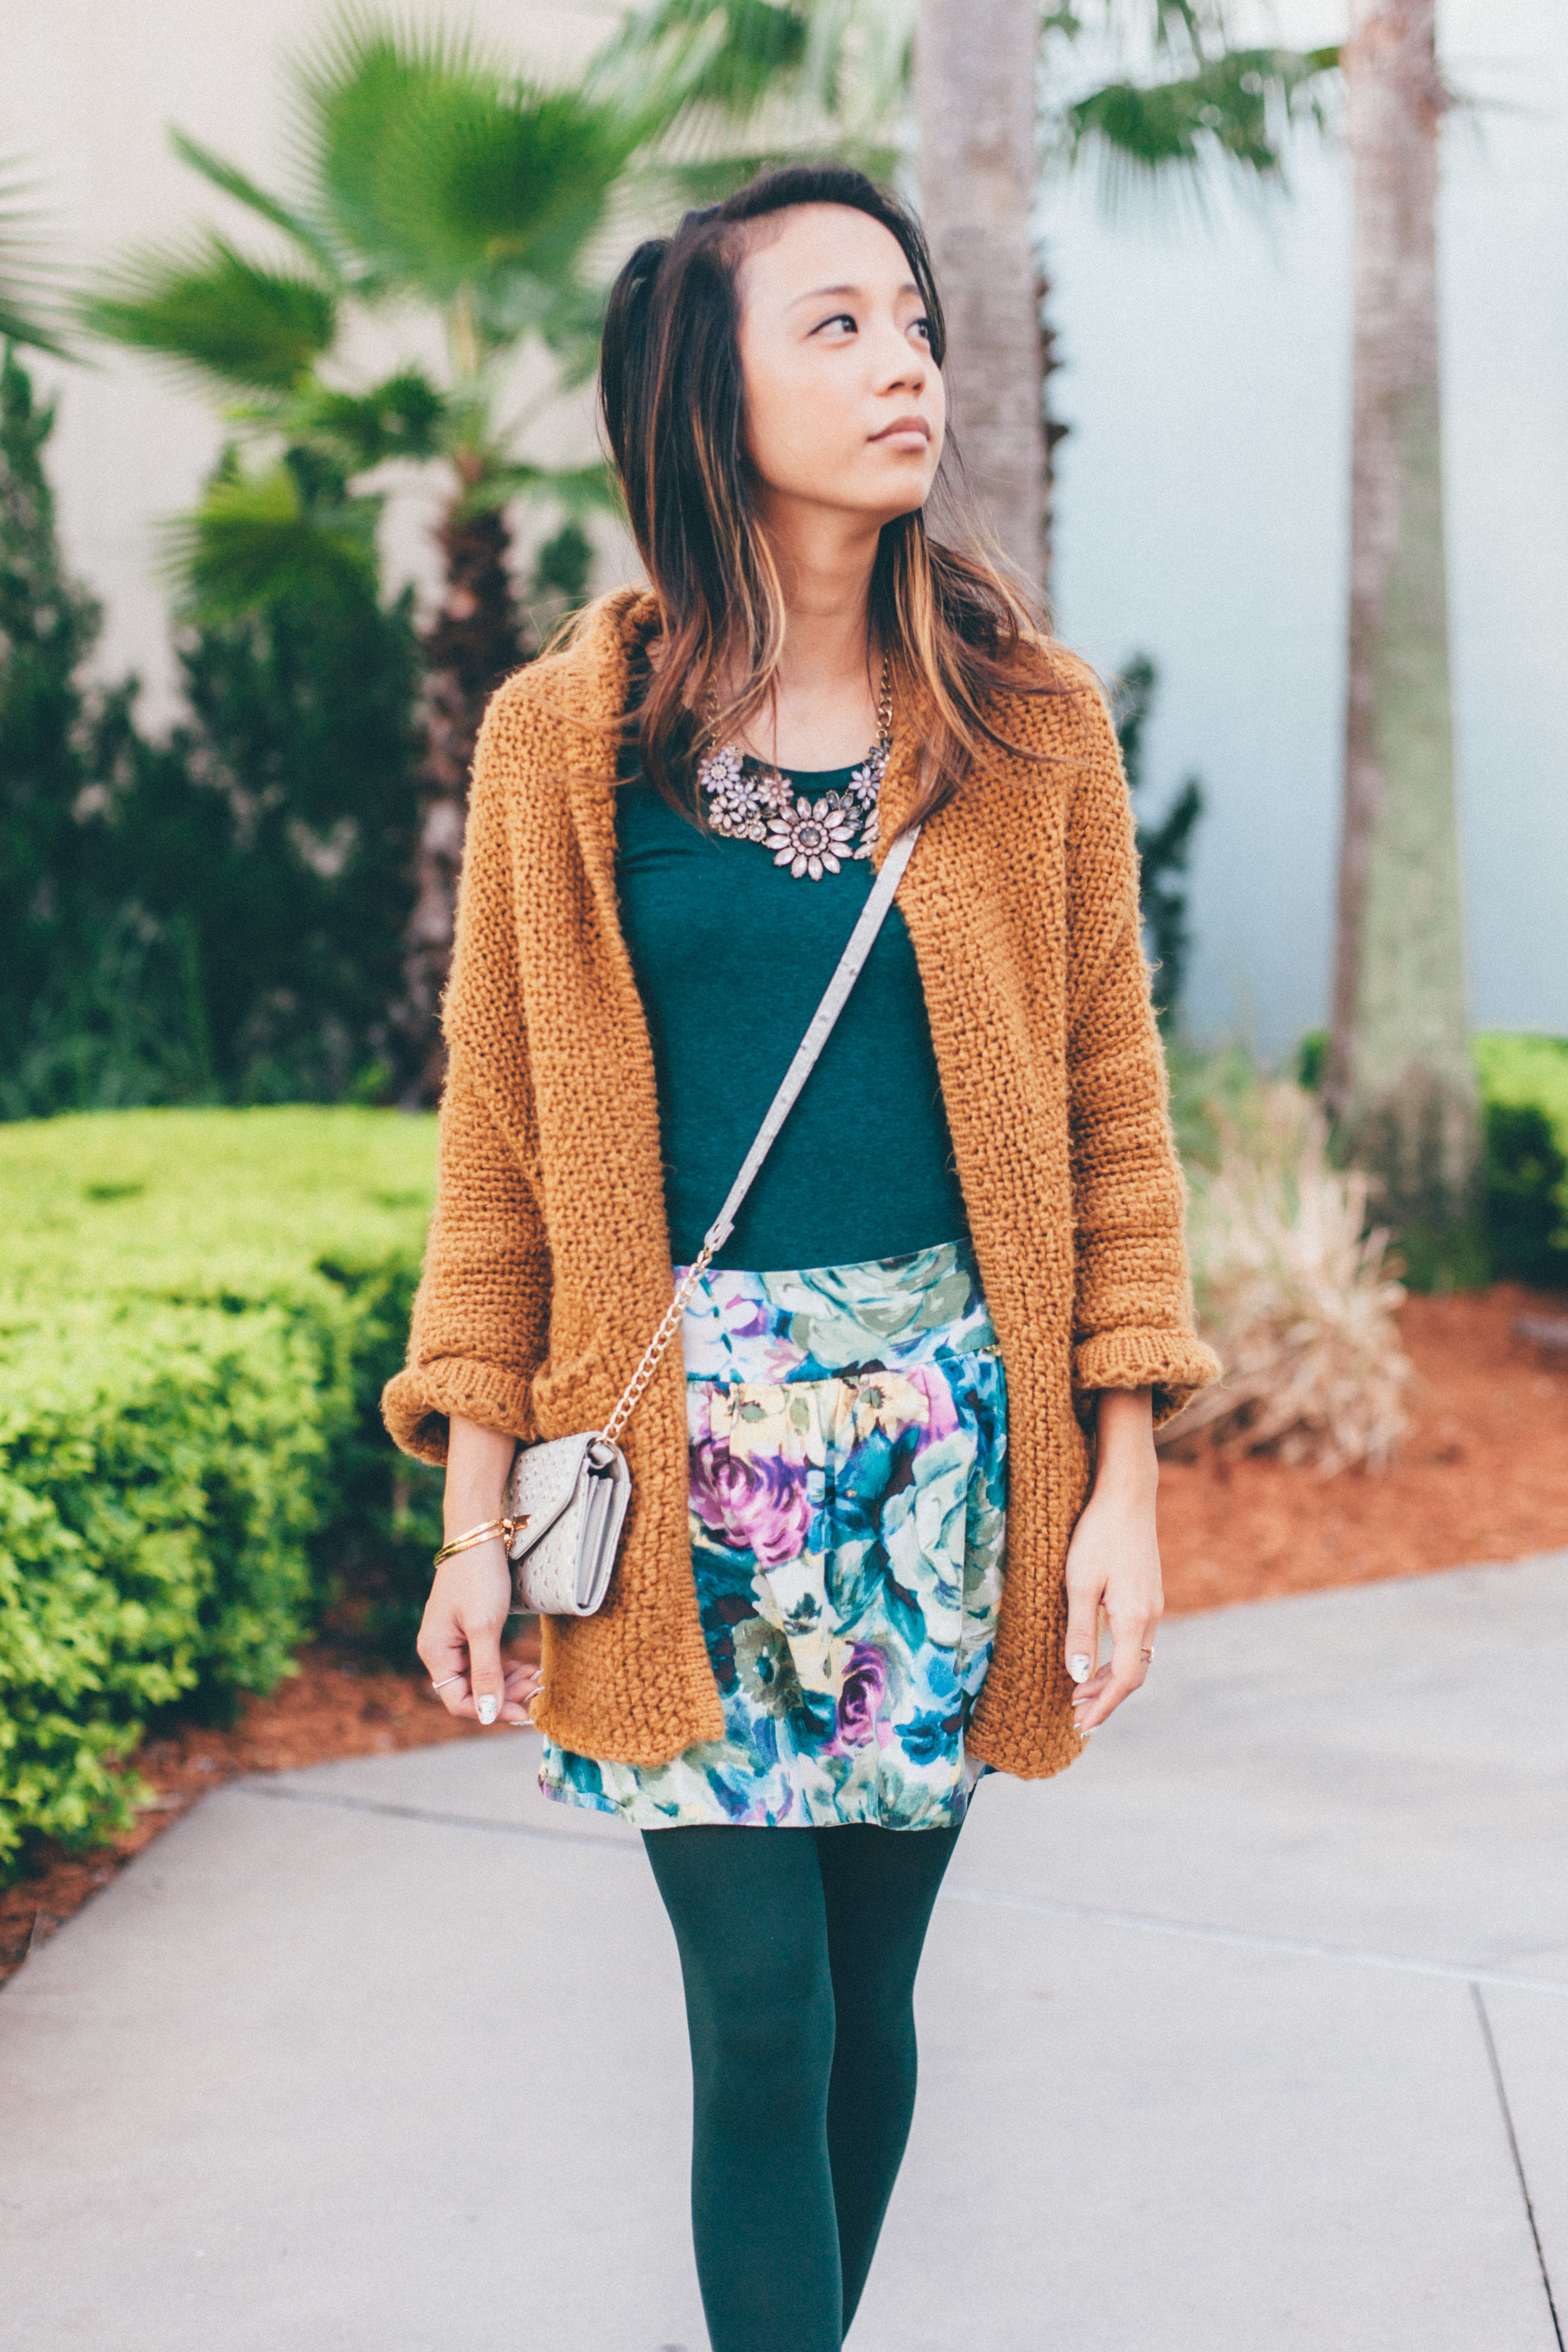 This Jenn Girl - Shein Sweater 1